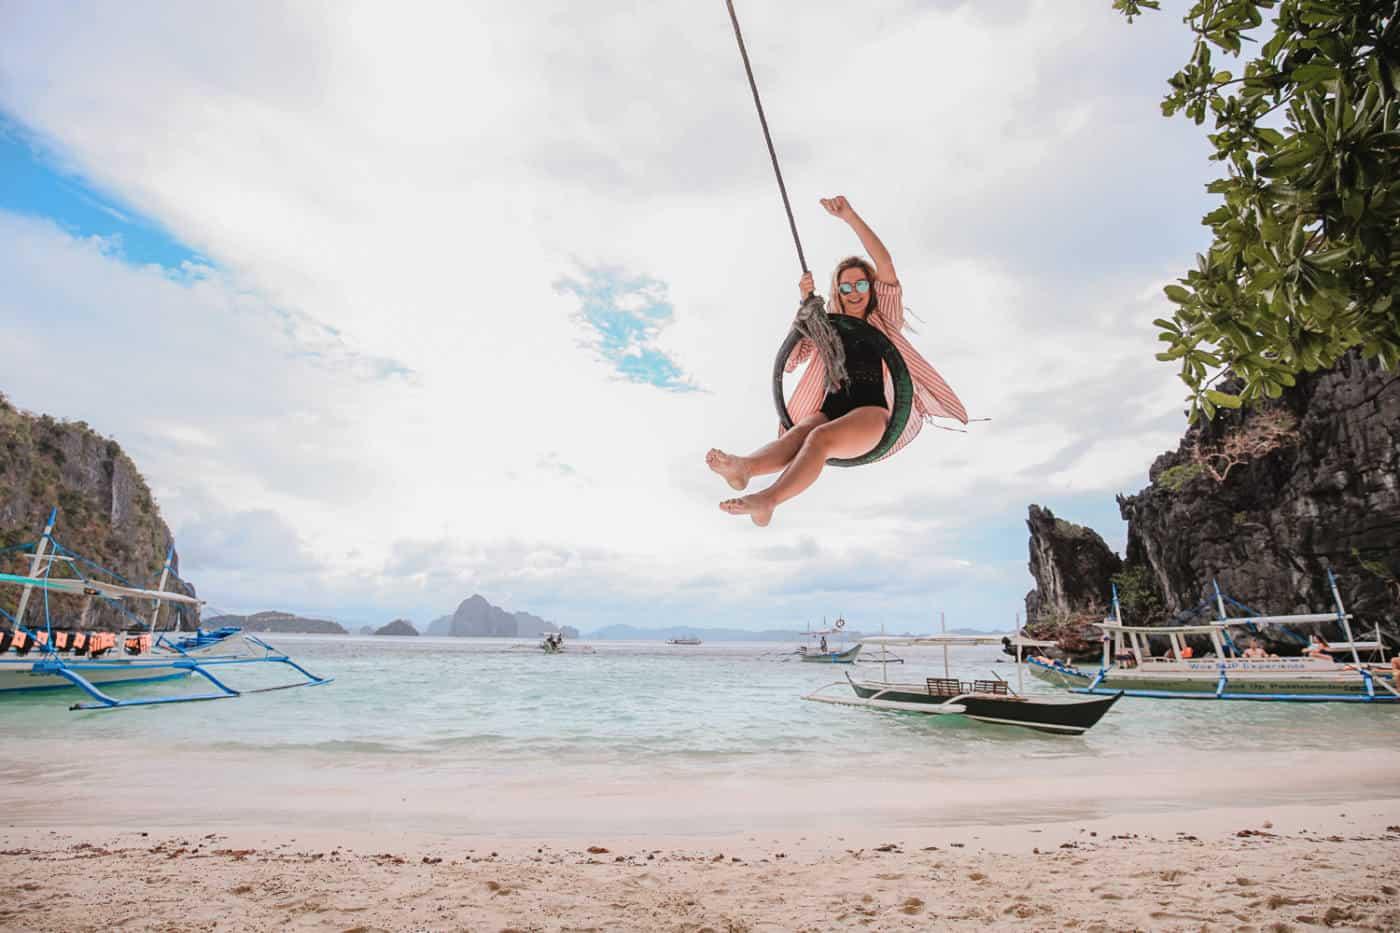 Philippines beach el nido tour palawan